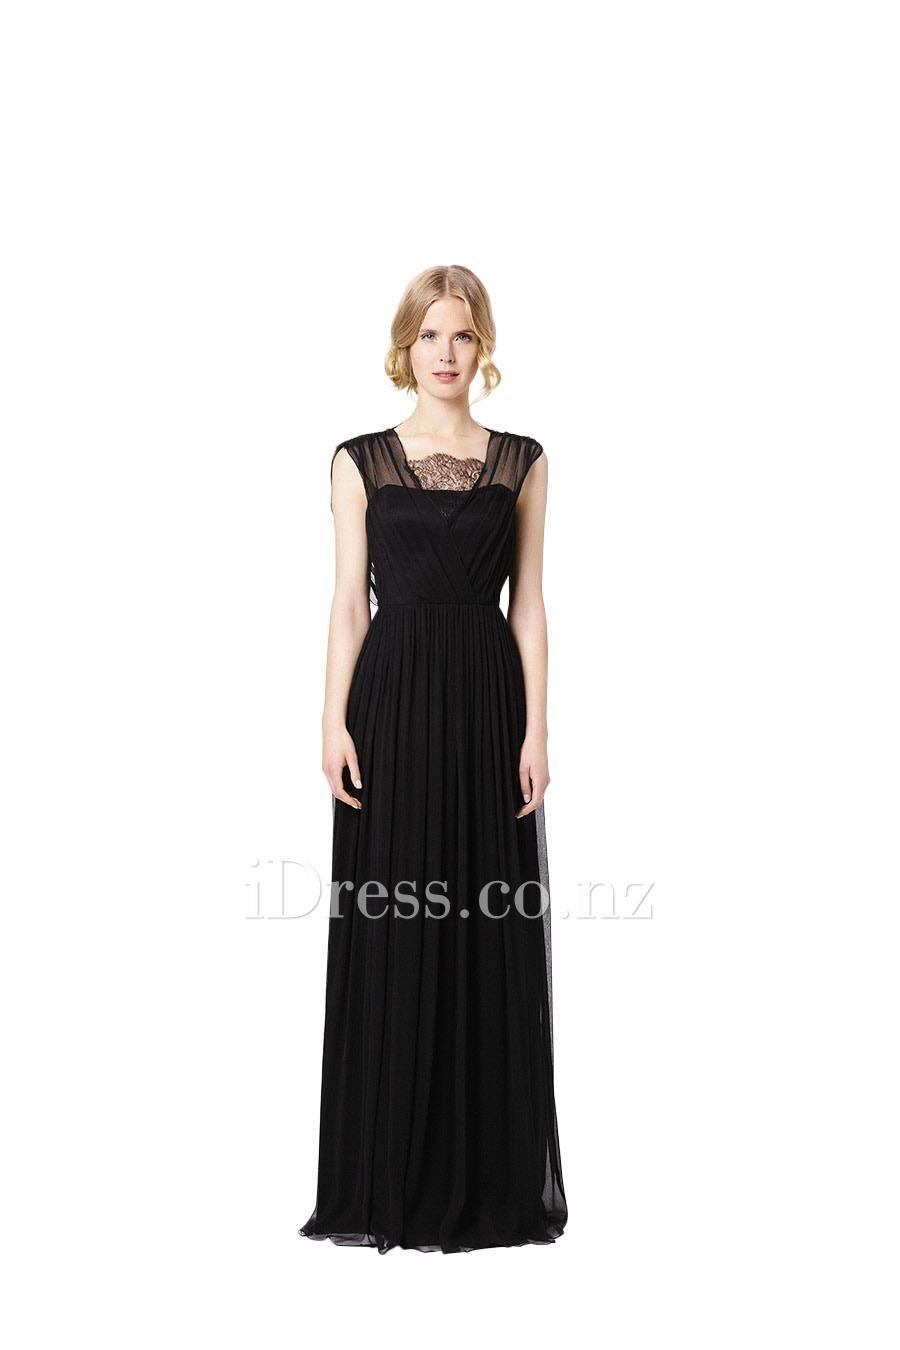 Black Wide Strap Long Chiffon Bridesmaid Dress with Lace Patterns ...